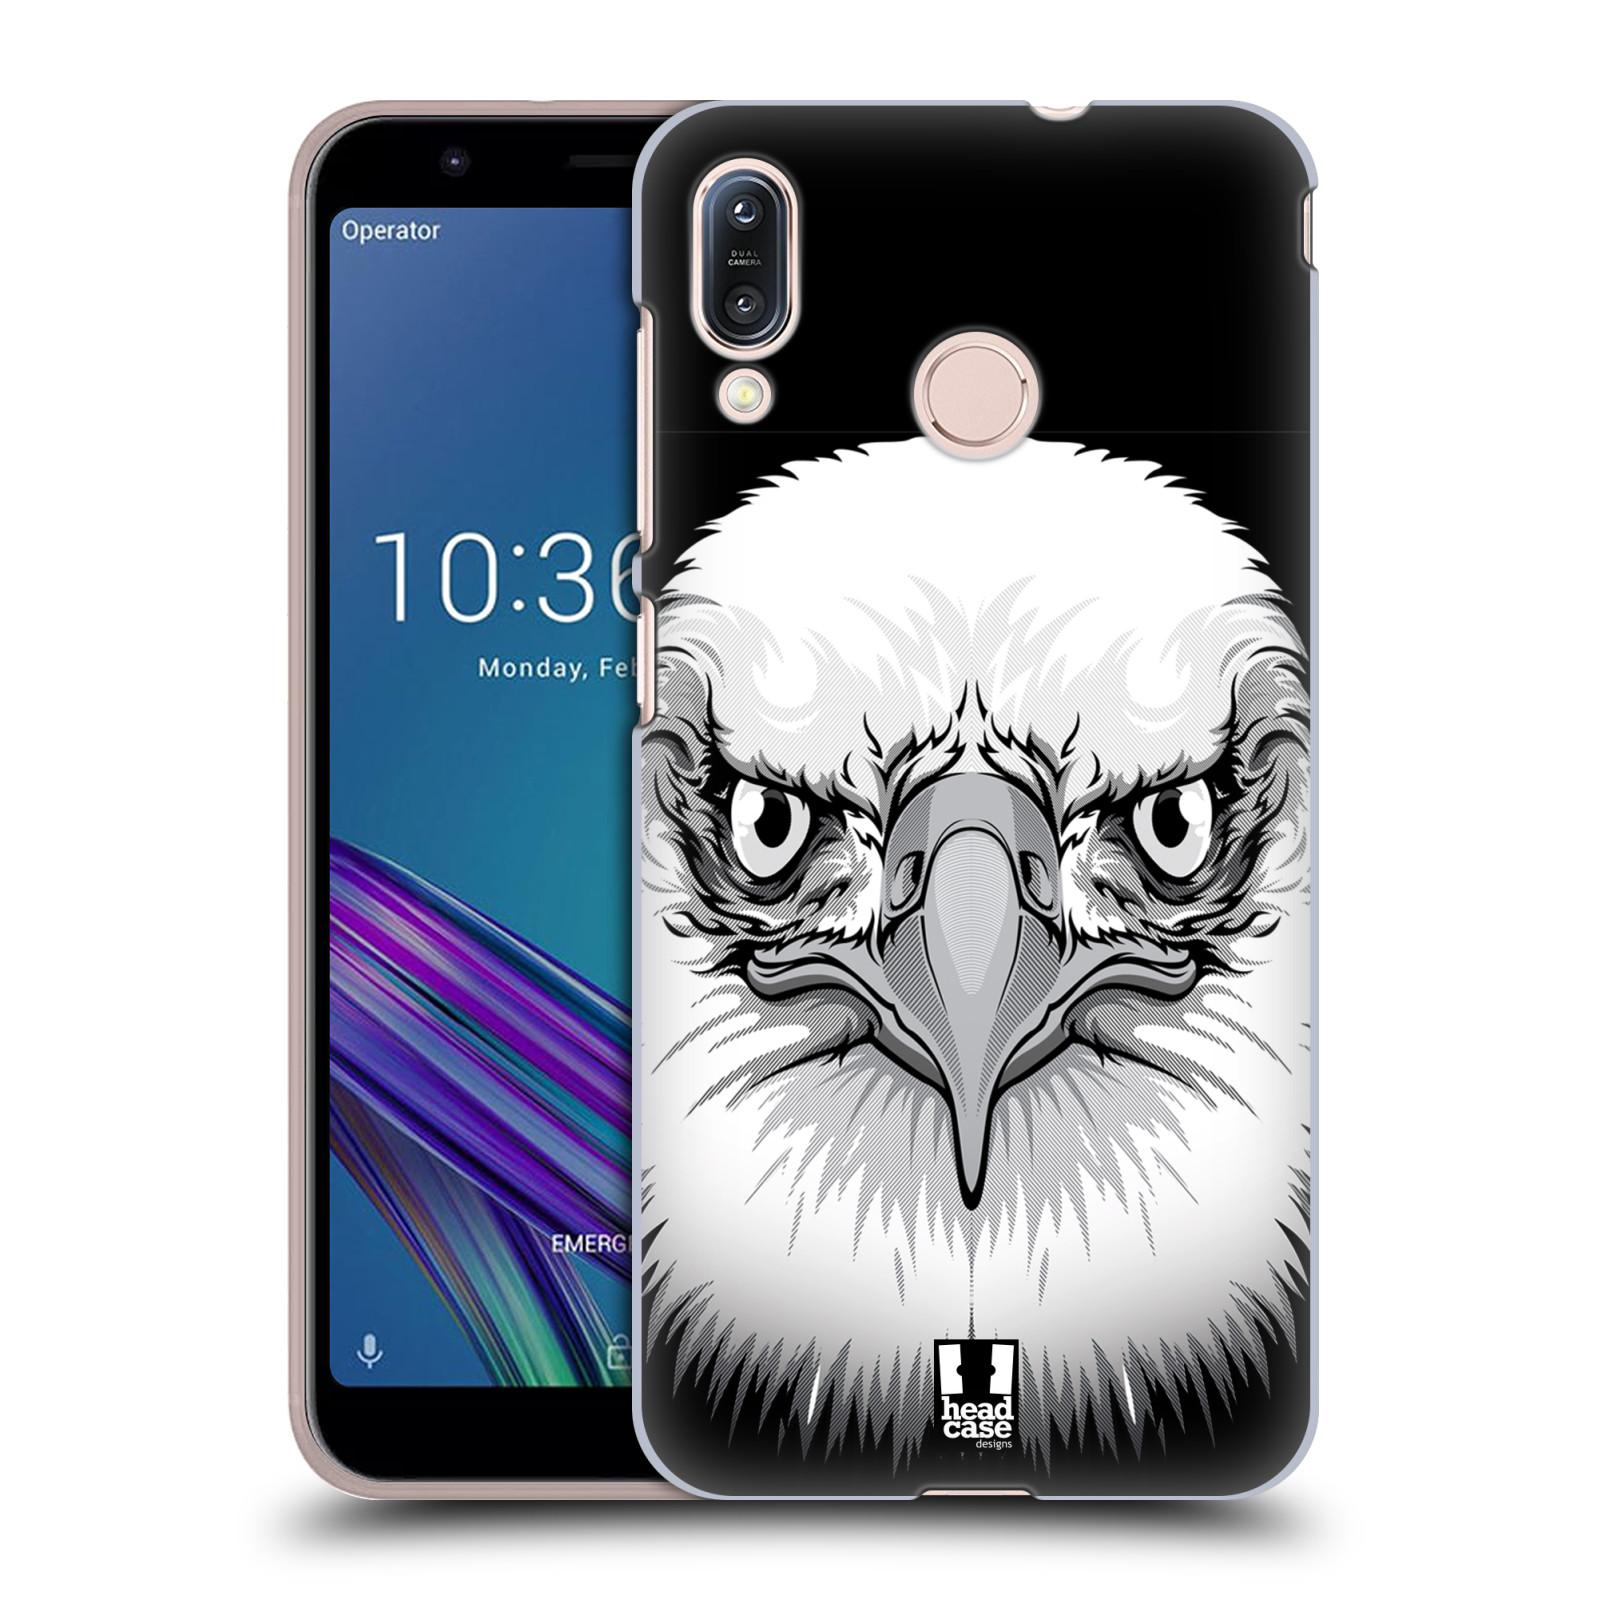 Plastové pouzdro na mobil Asus Zenfone Max M1 ZB555KL - Head Case - ILUSTROVANÝ OREL